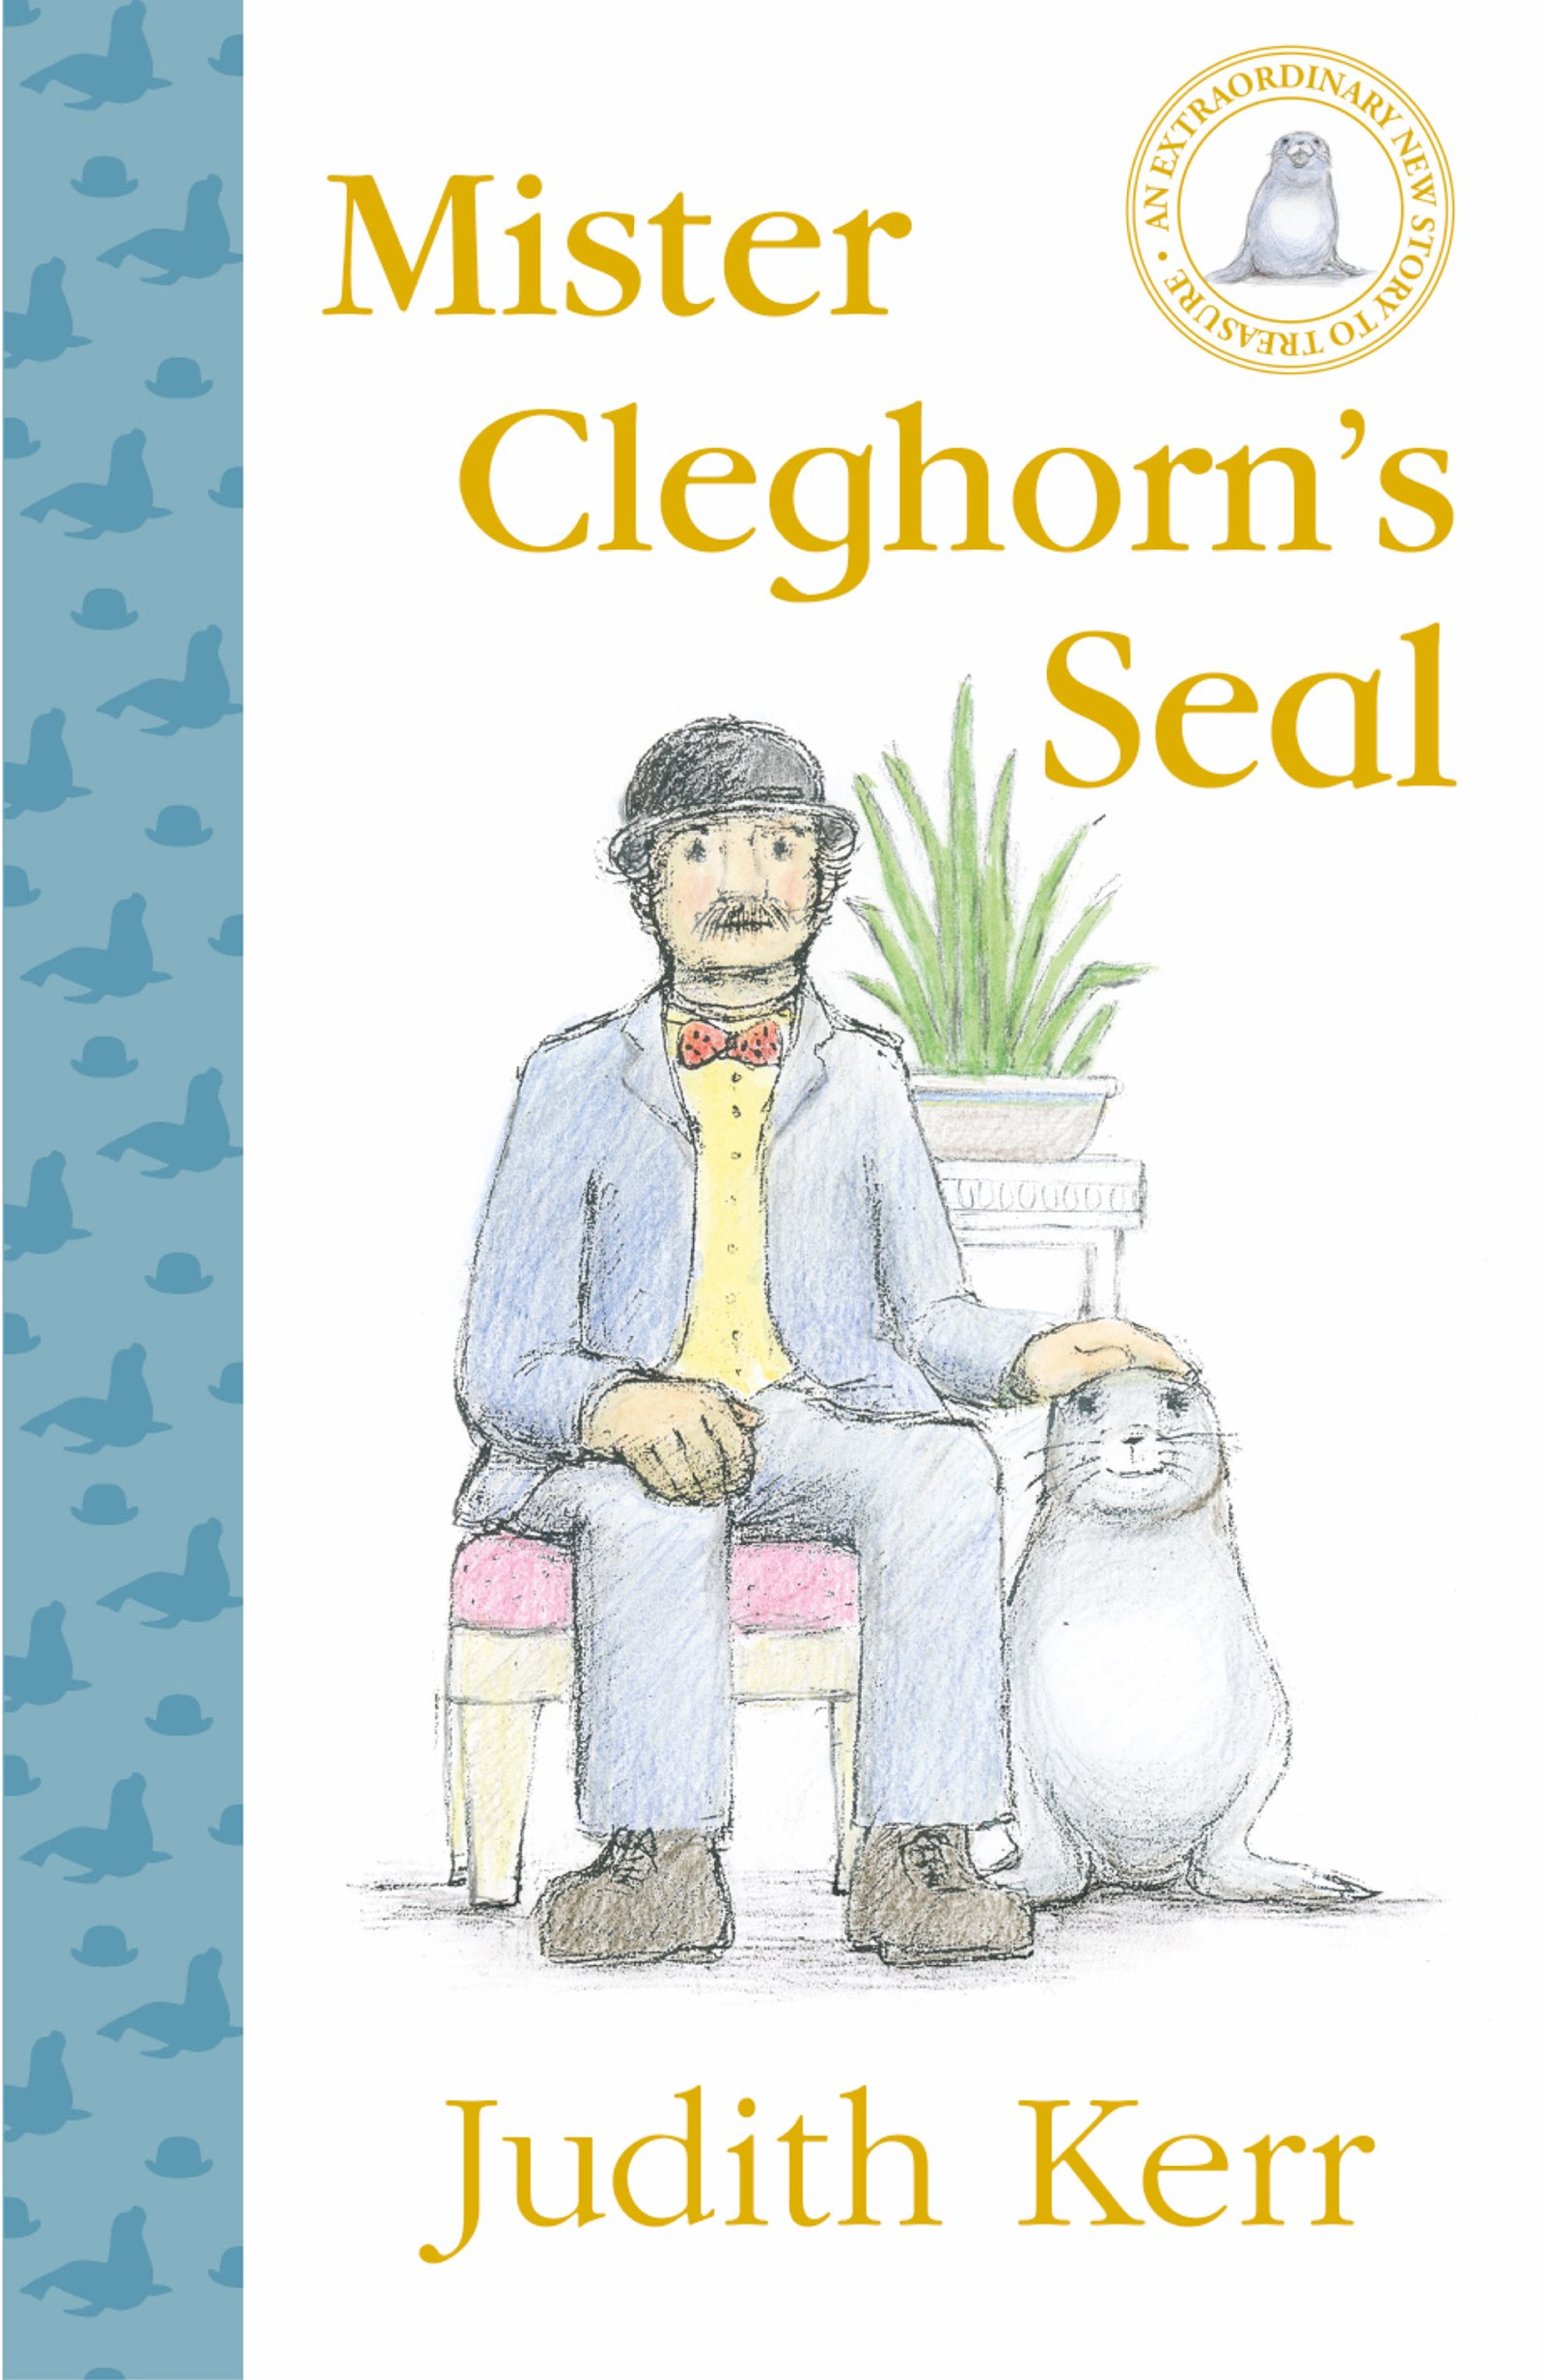 Mister Cleghorn\'s Seal: Judith Kerr: 9780008170837: Amazon.com: Books